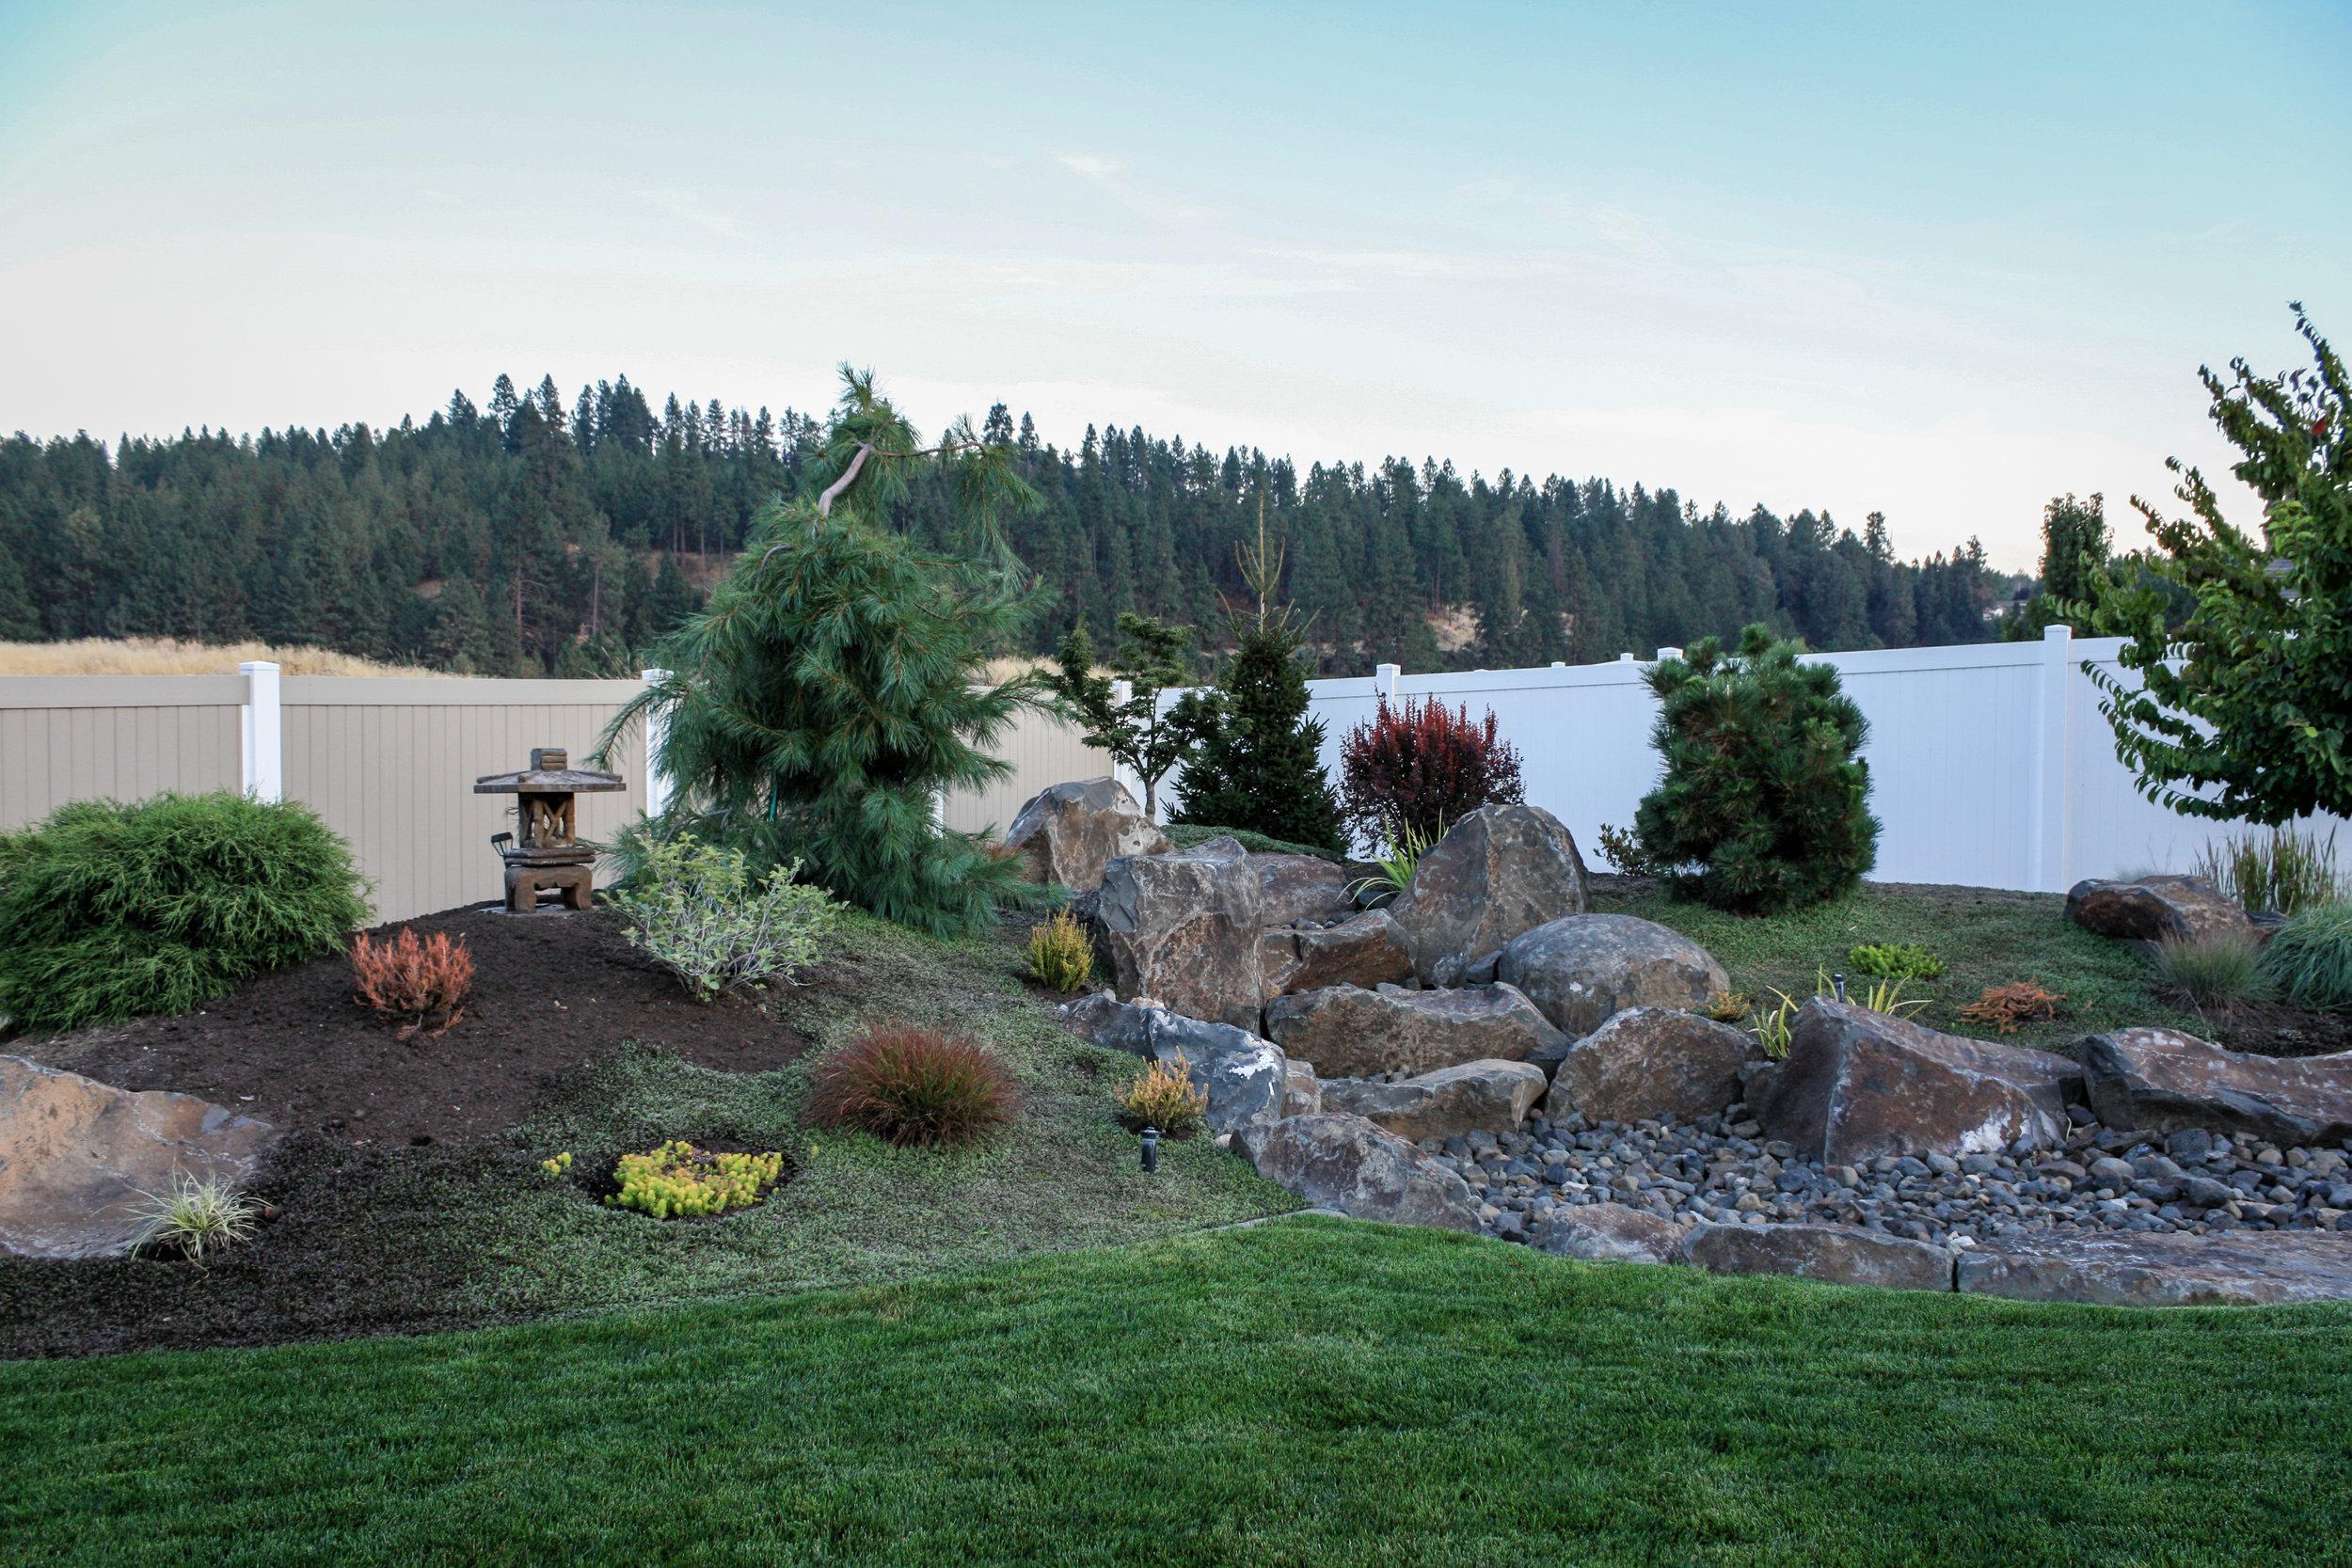 spokane-valley-rockwork-1.jpg